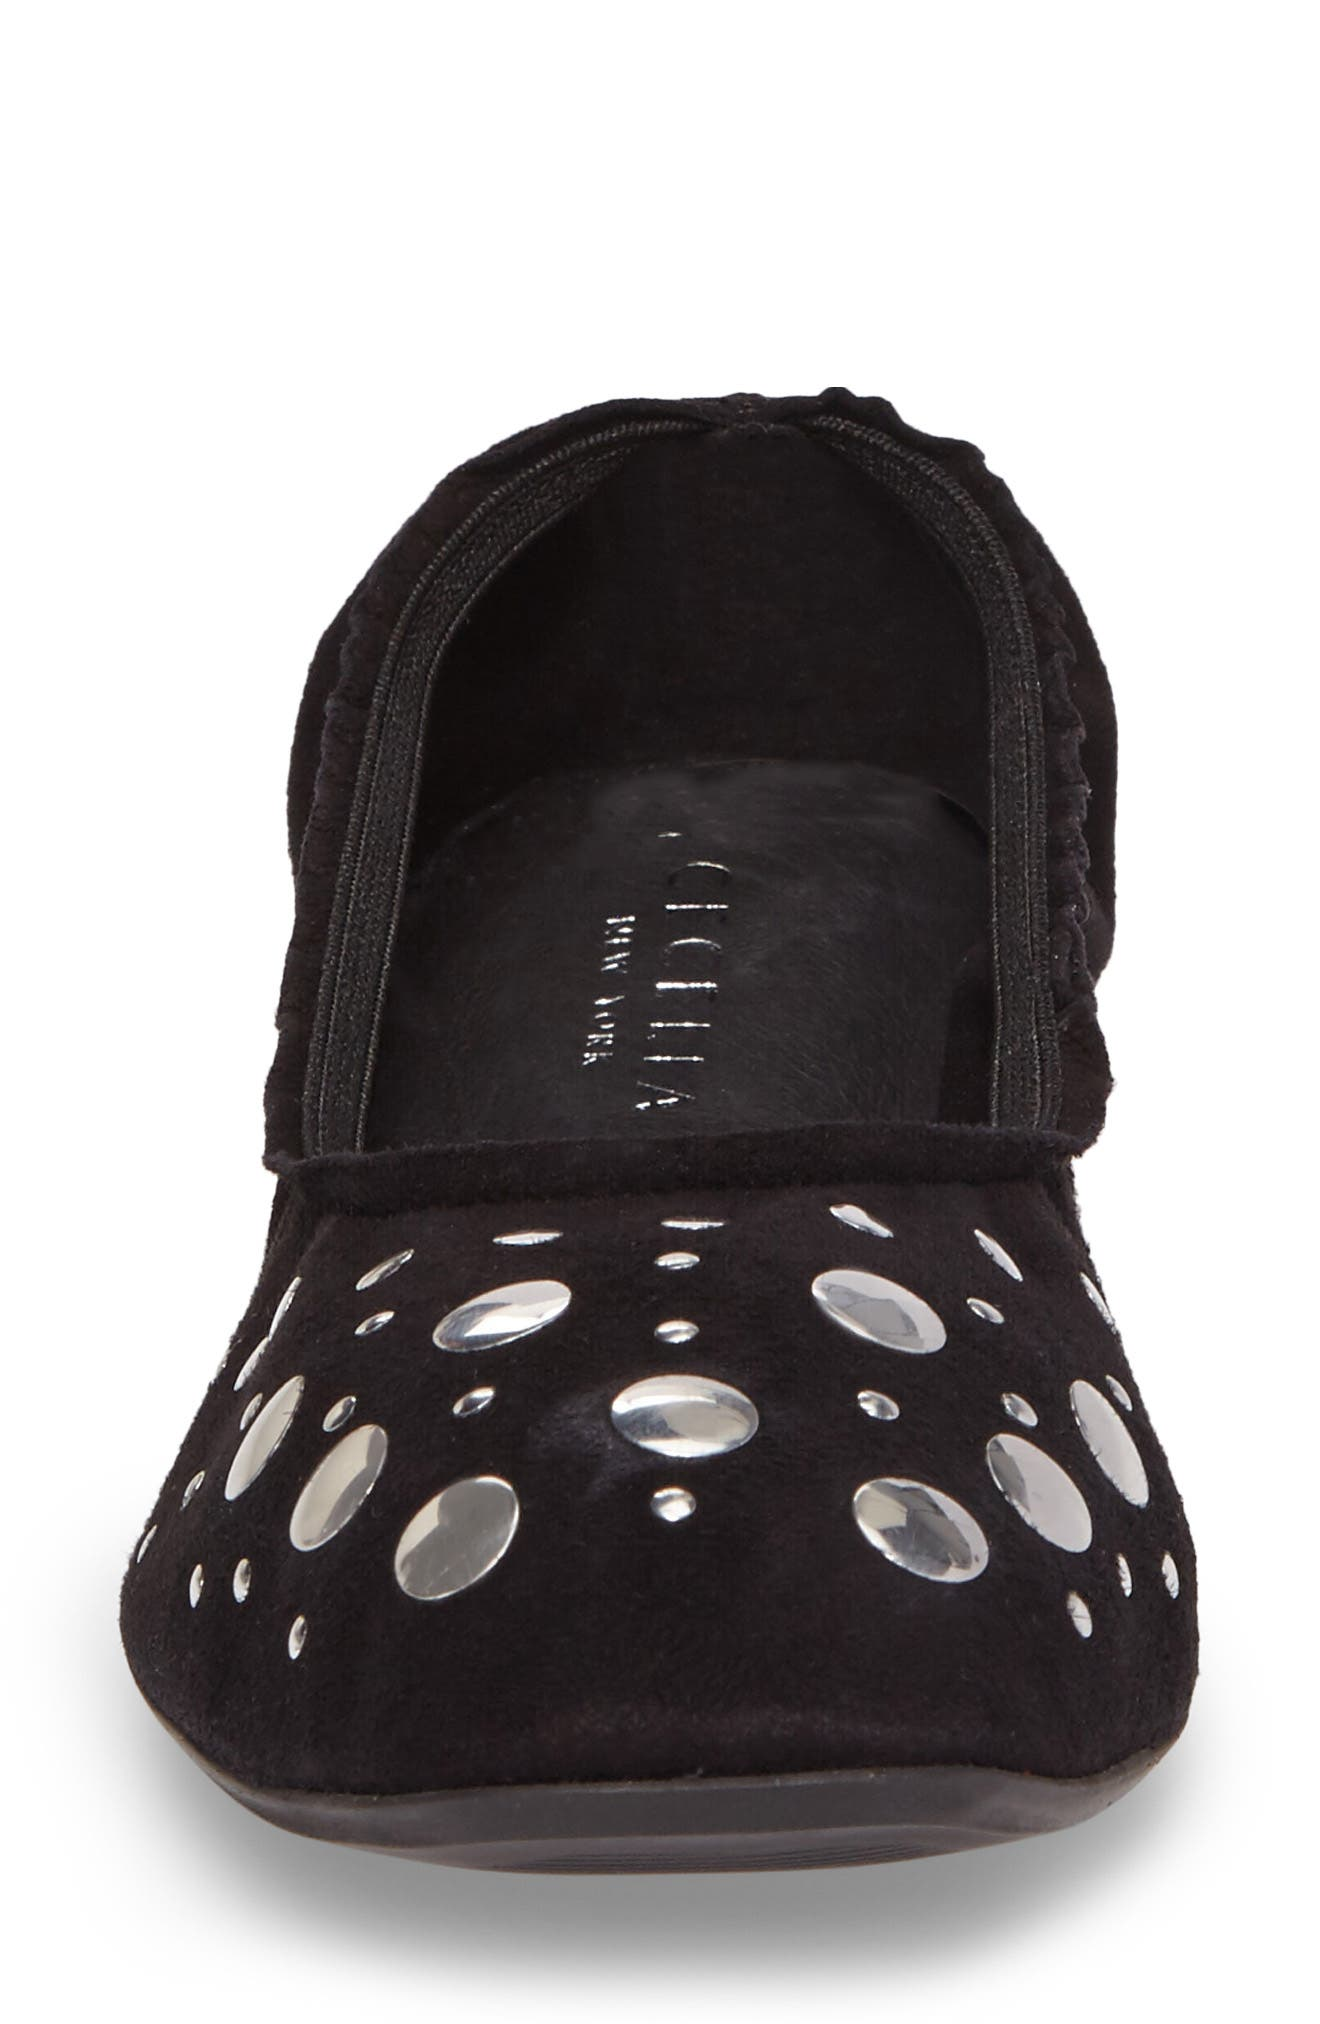 Jacob Ballet Flat,                             Alternate thumbnail 4, color,                             Black Leather